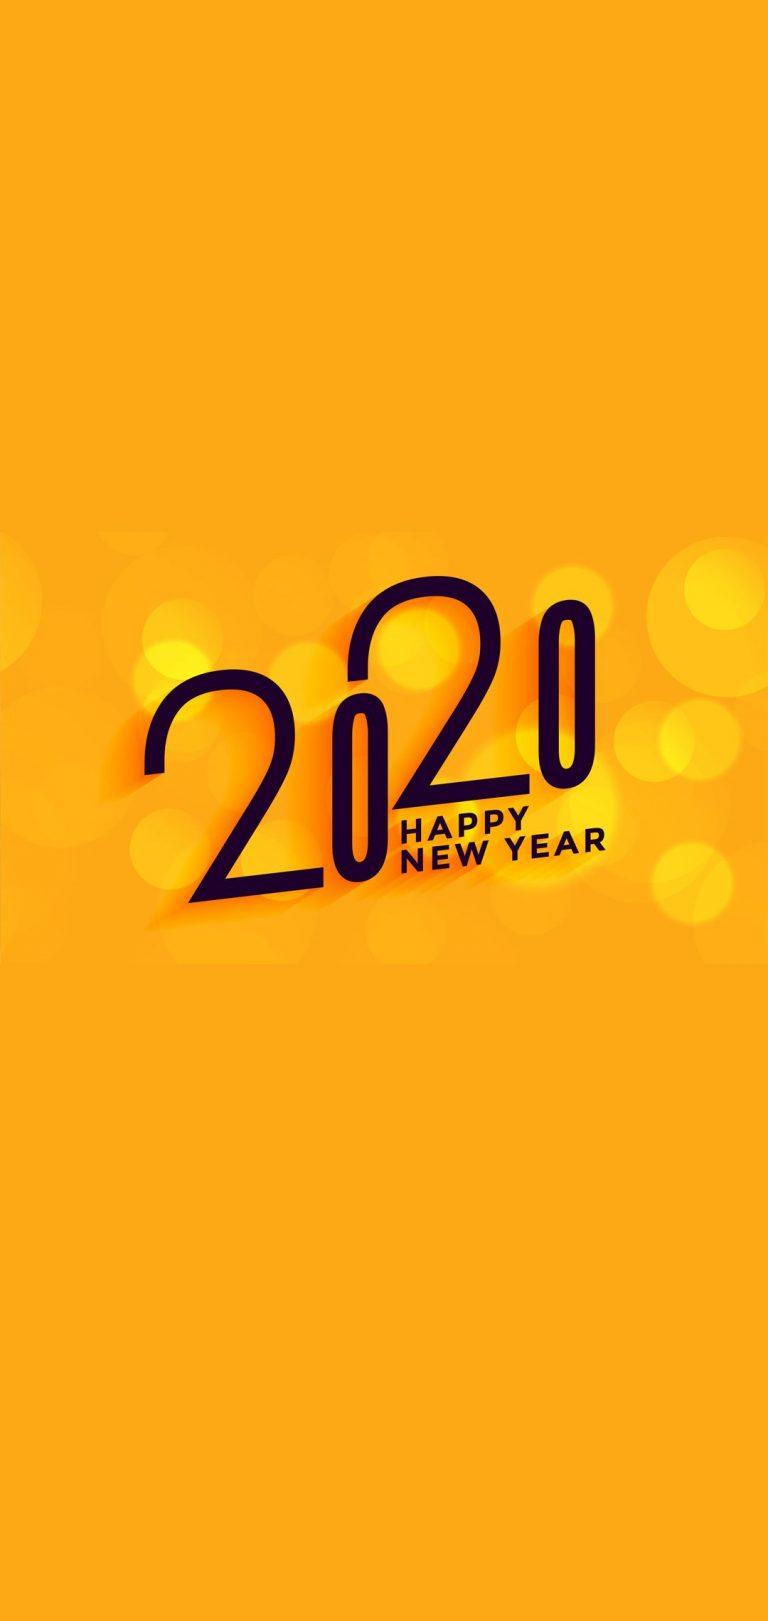 Happy New Year 2020 Phone Wallpaper 03 - [1080x2280]